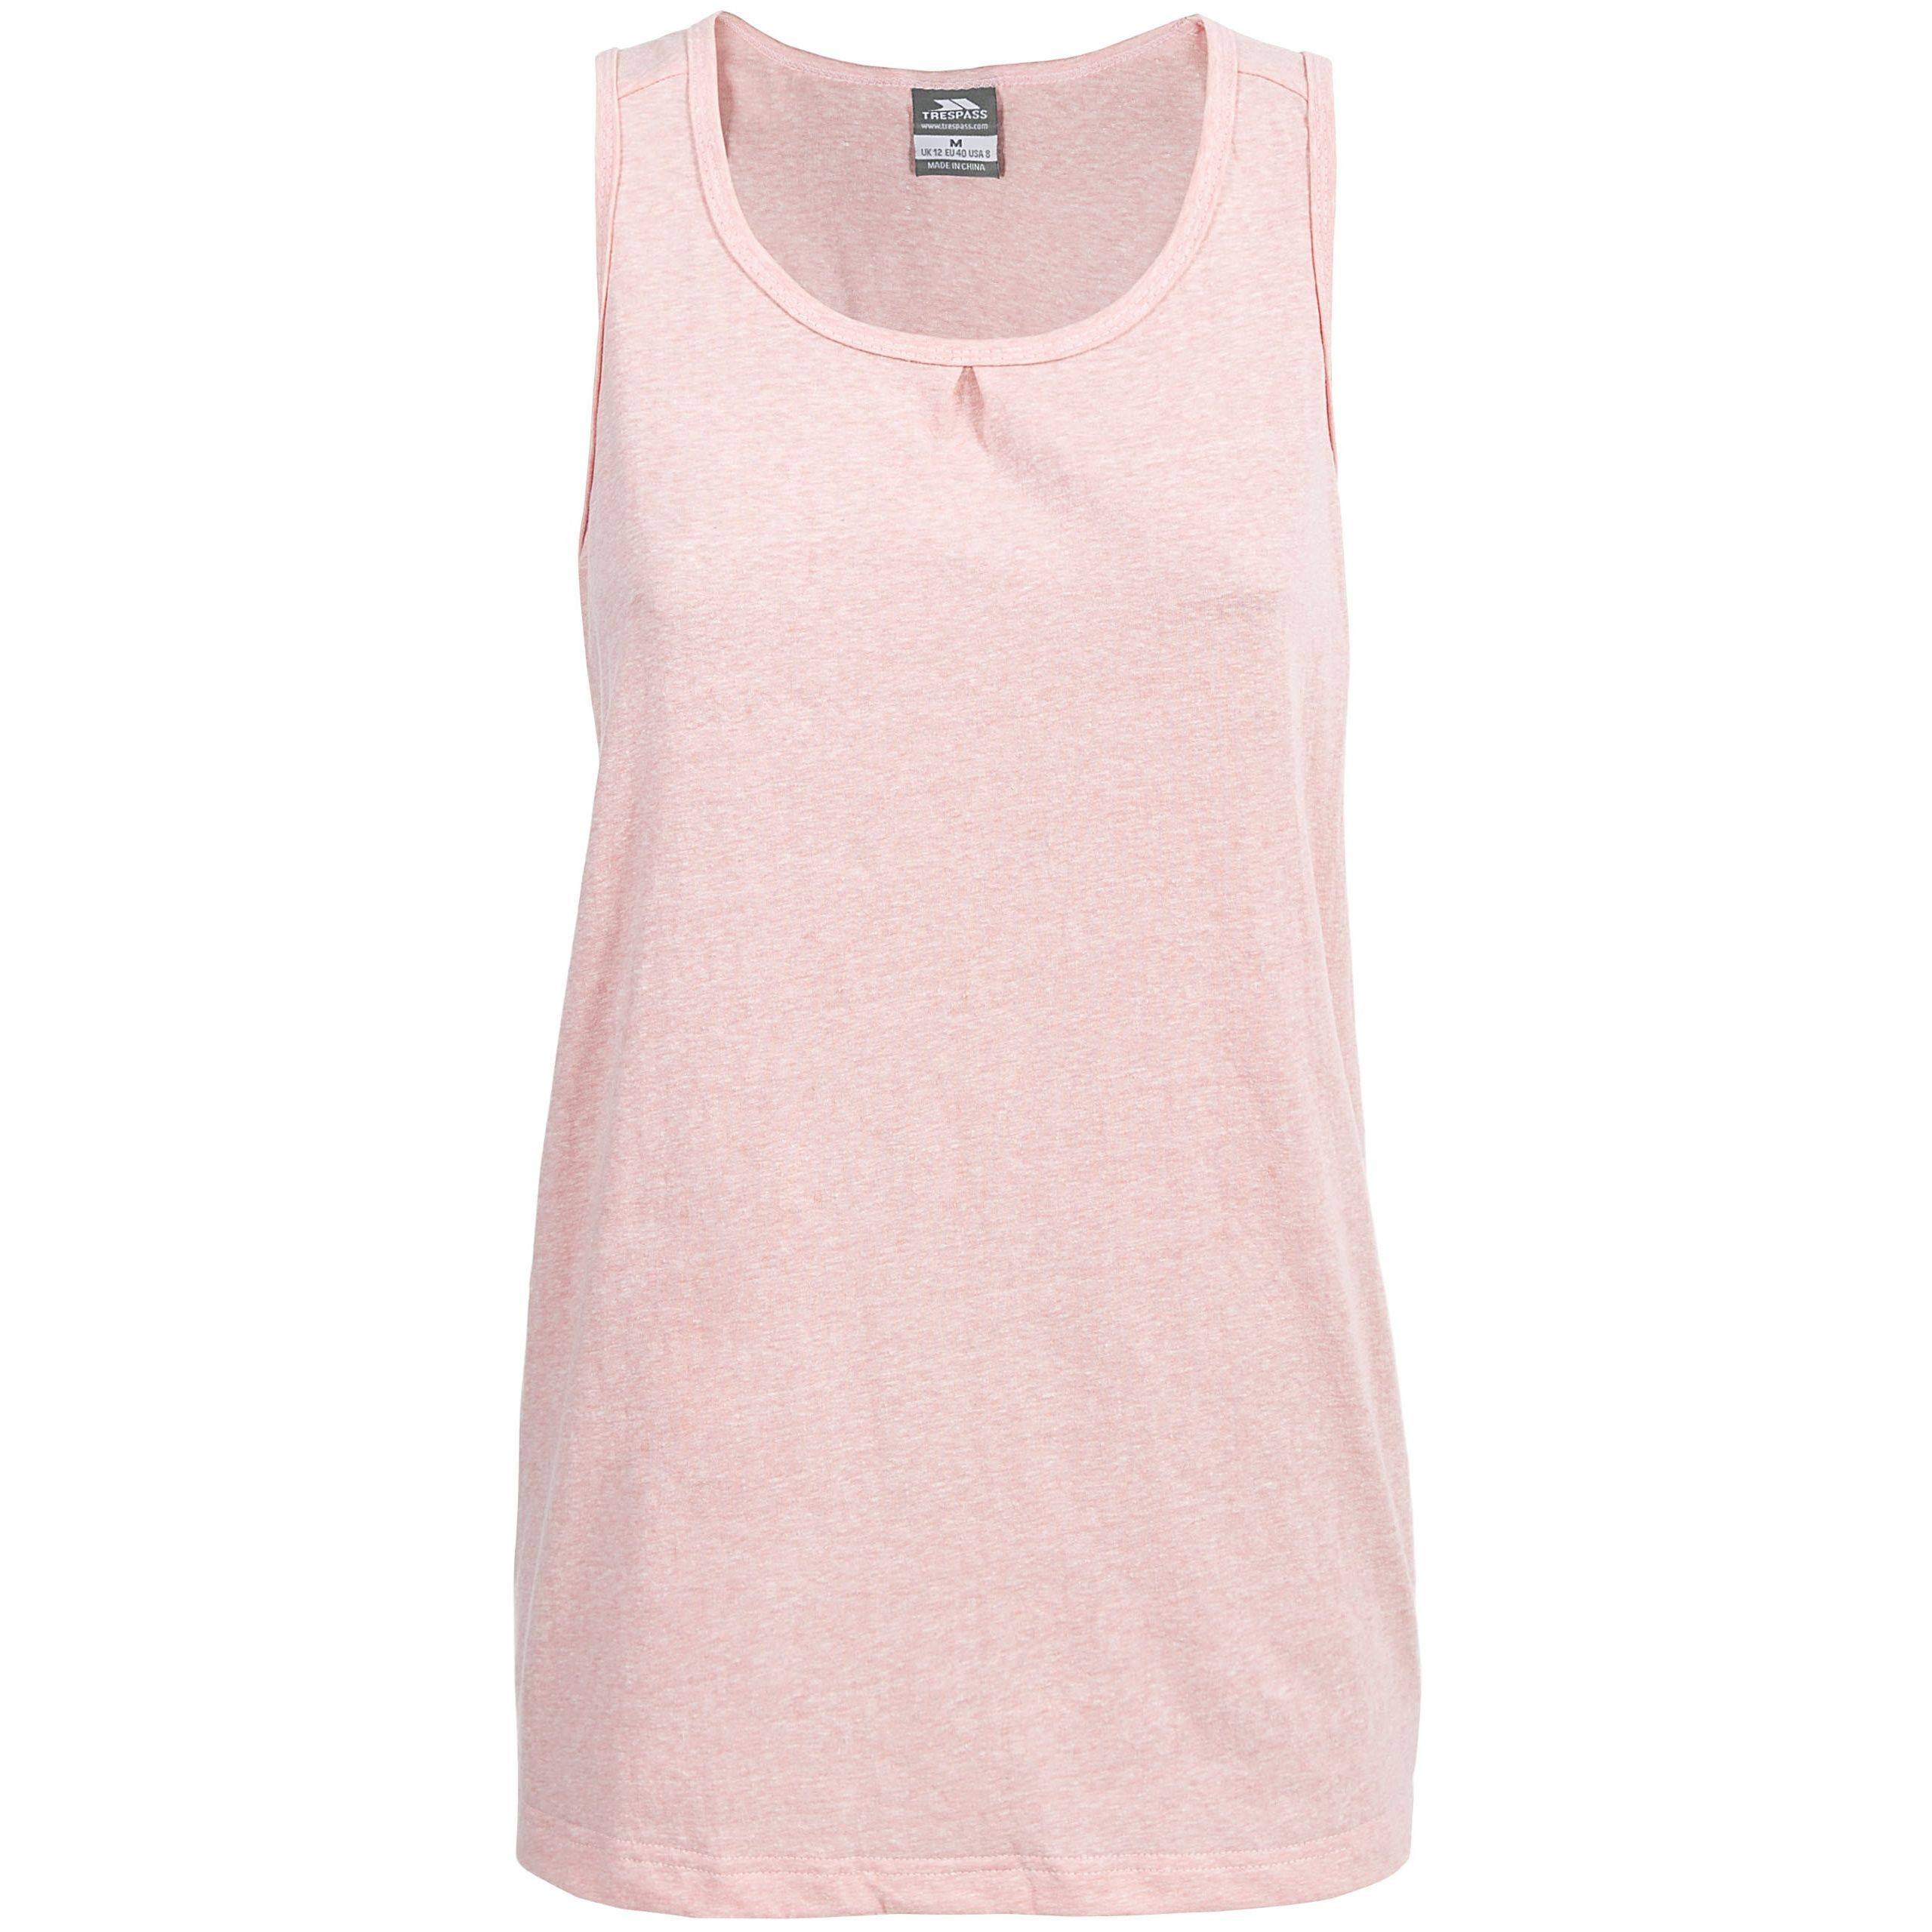 Trespass Womens/Ladies Caldera Sleeveless Vest Top